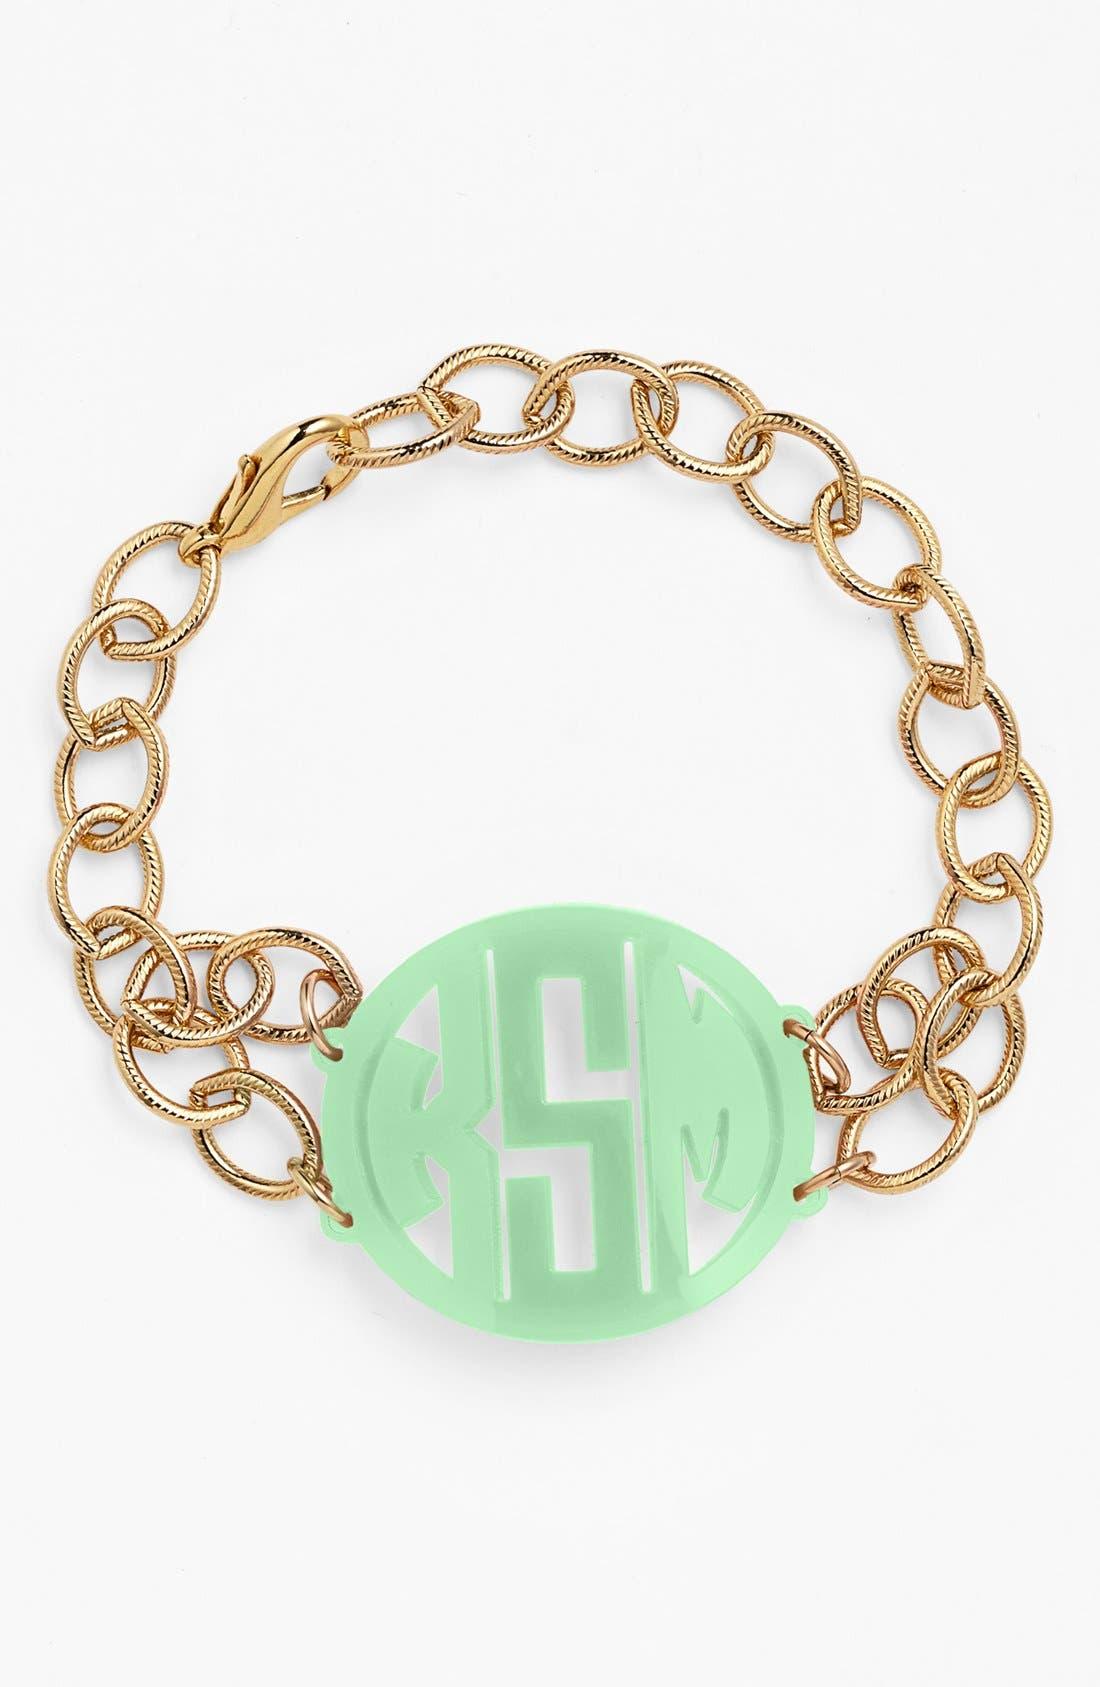 MOON AND LOLA, 'Annabel' Medium Personalized Monogram Bracelet, Main thumbnail 1, color, MINT/ GOLD